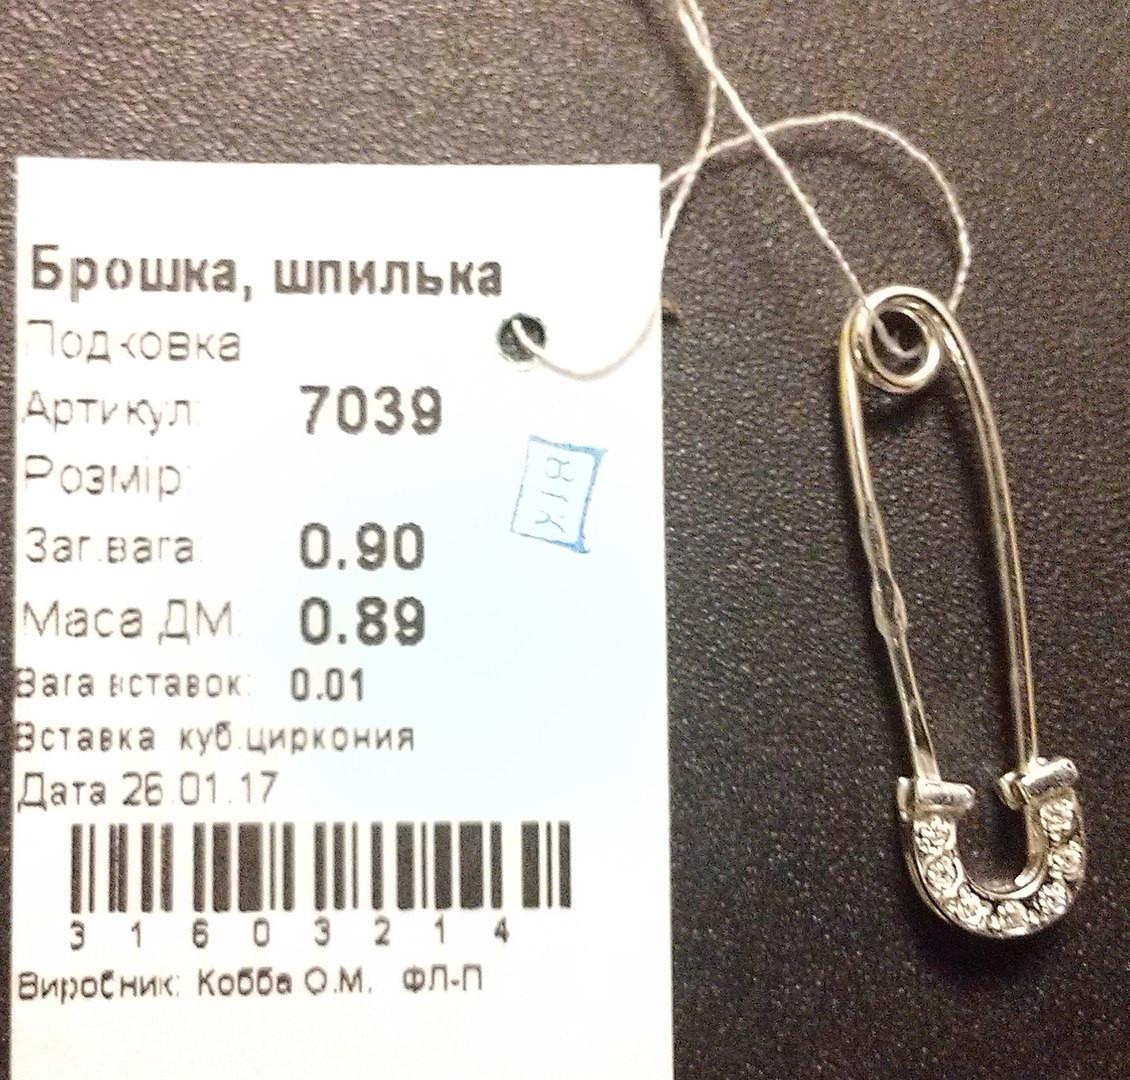 Булавка серебро 925 пробы Подковка